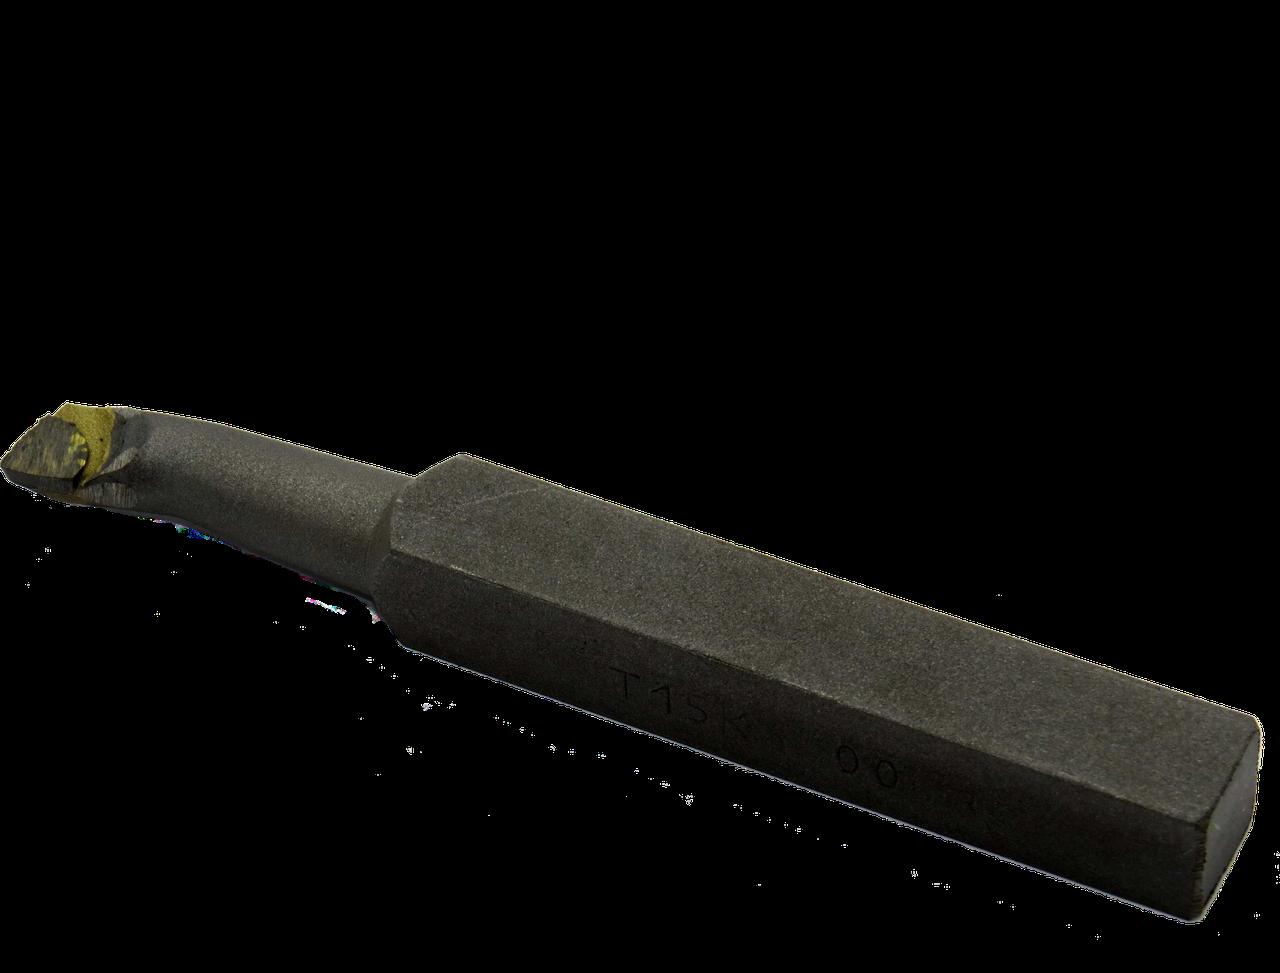 Резец 16х16х140 (Т15К6) расточной для глухих отверстий СИТО Беларусь